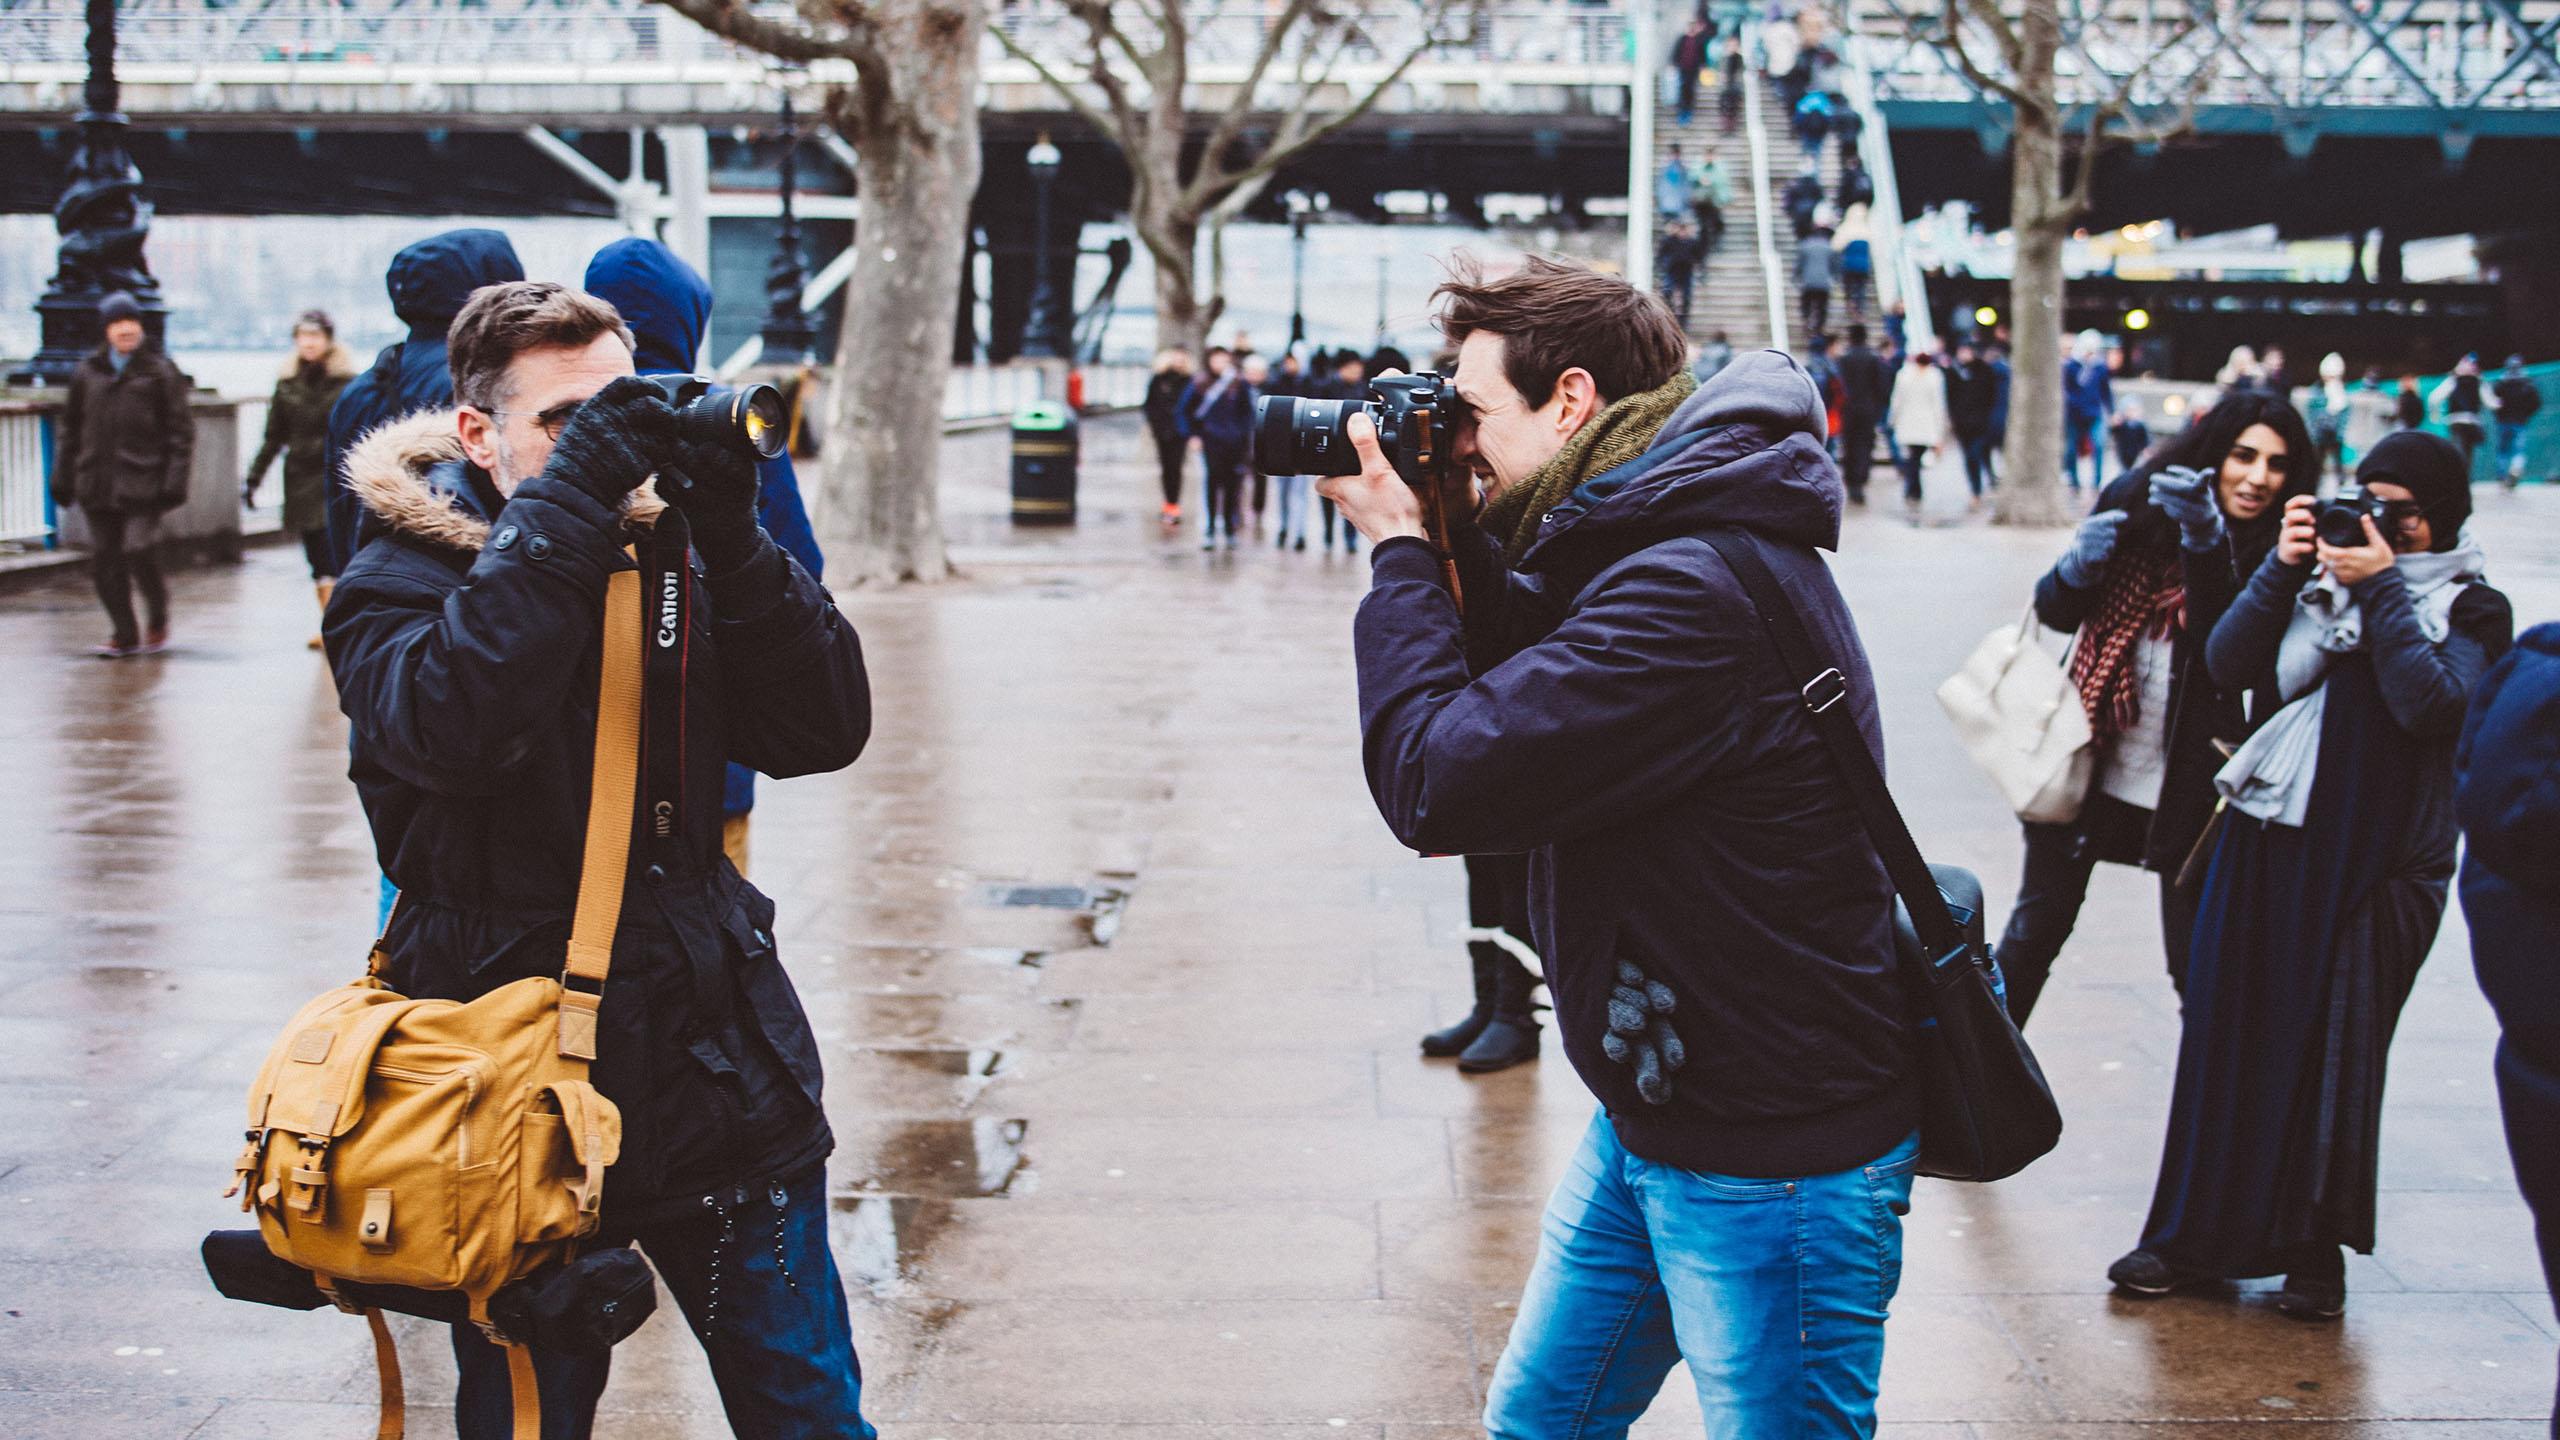 Showcase your visual storytelling skills and win! | Photofocus